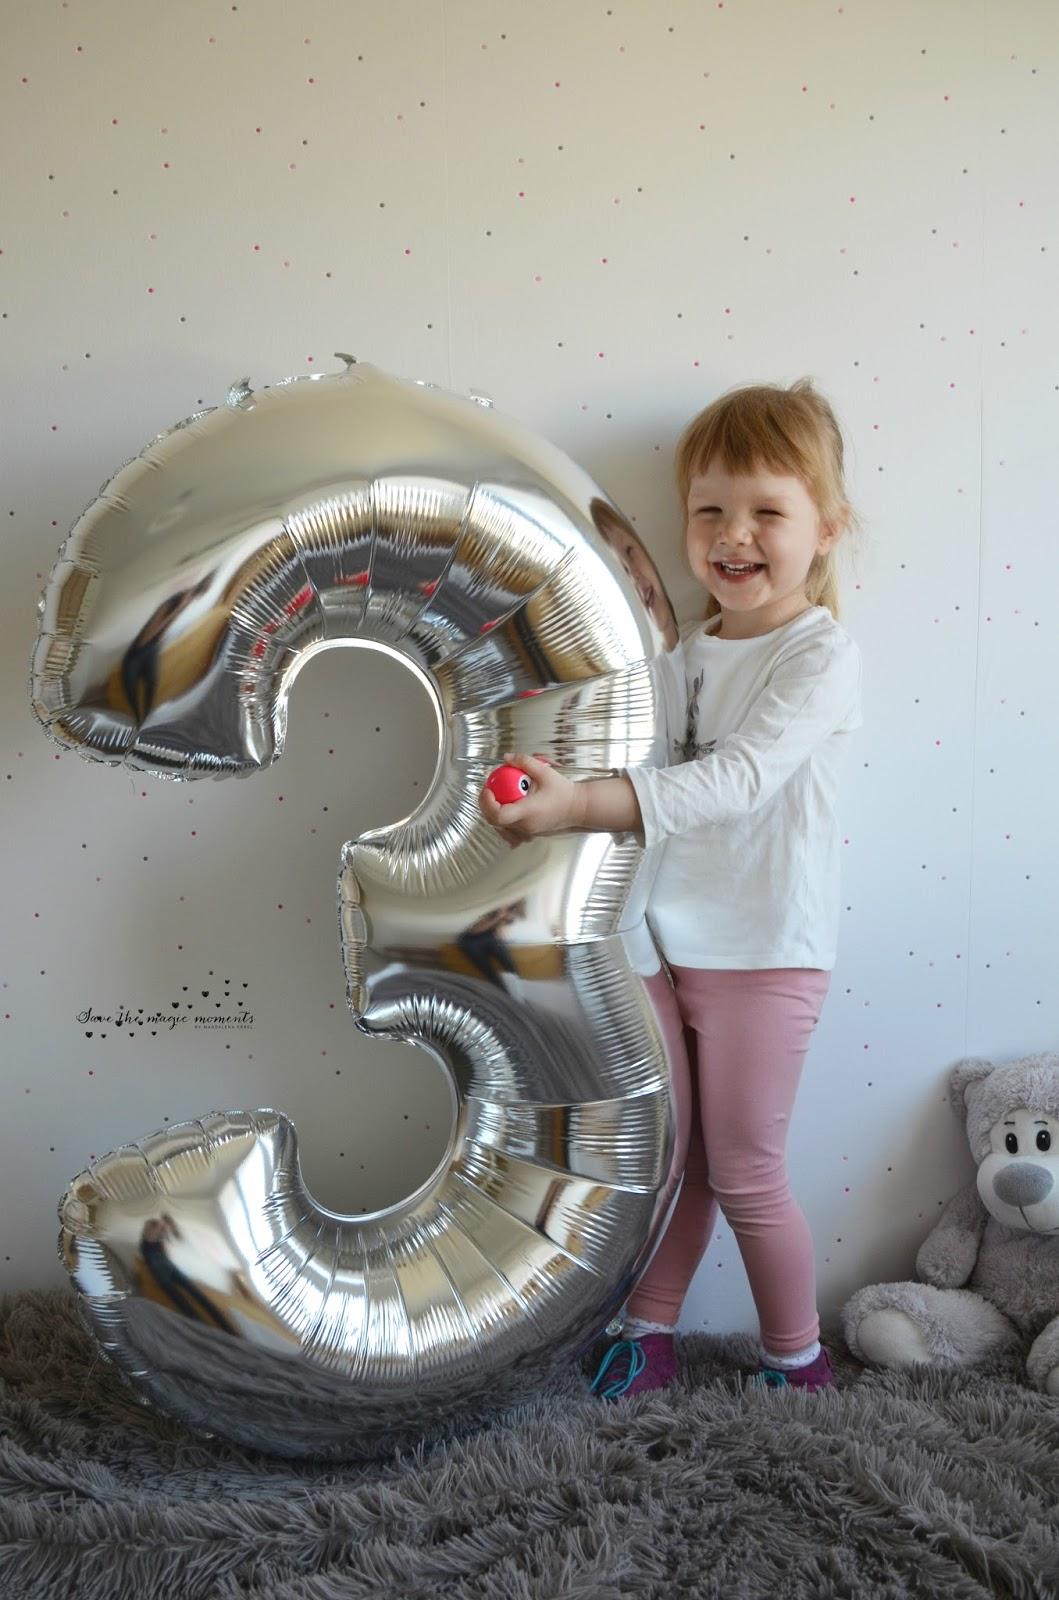 Niesamowite Save the Magic Moments : Mam 3 latka! KA92